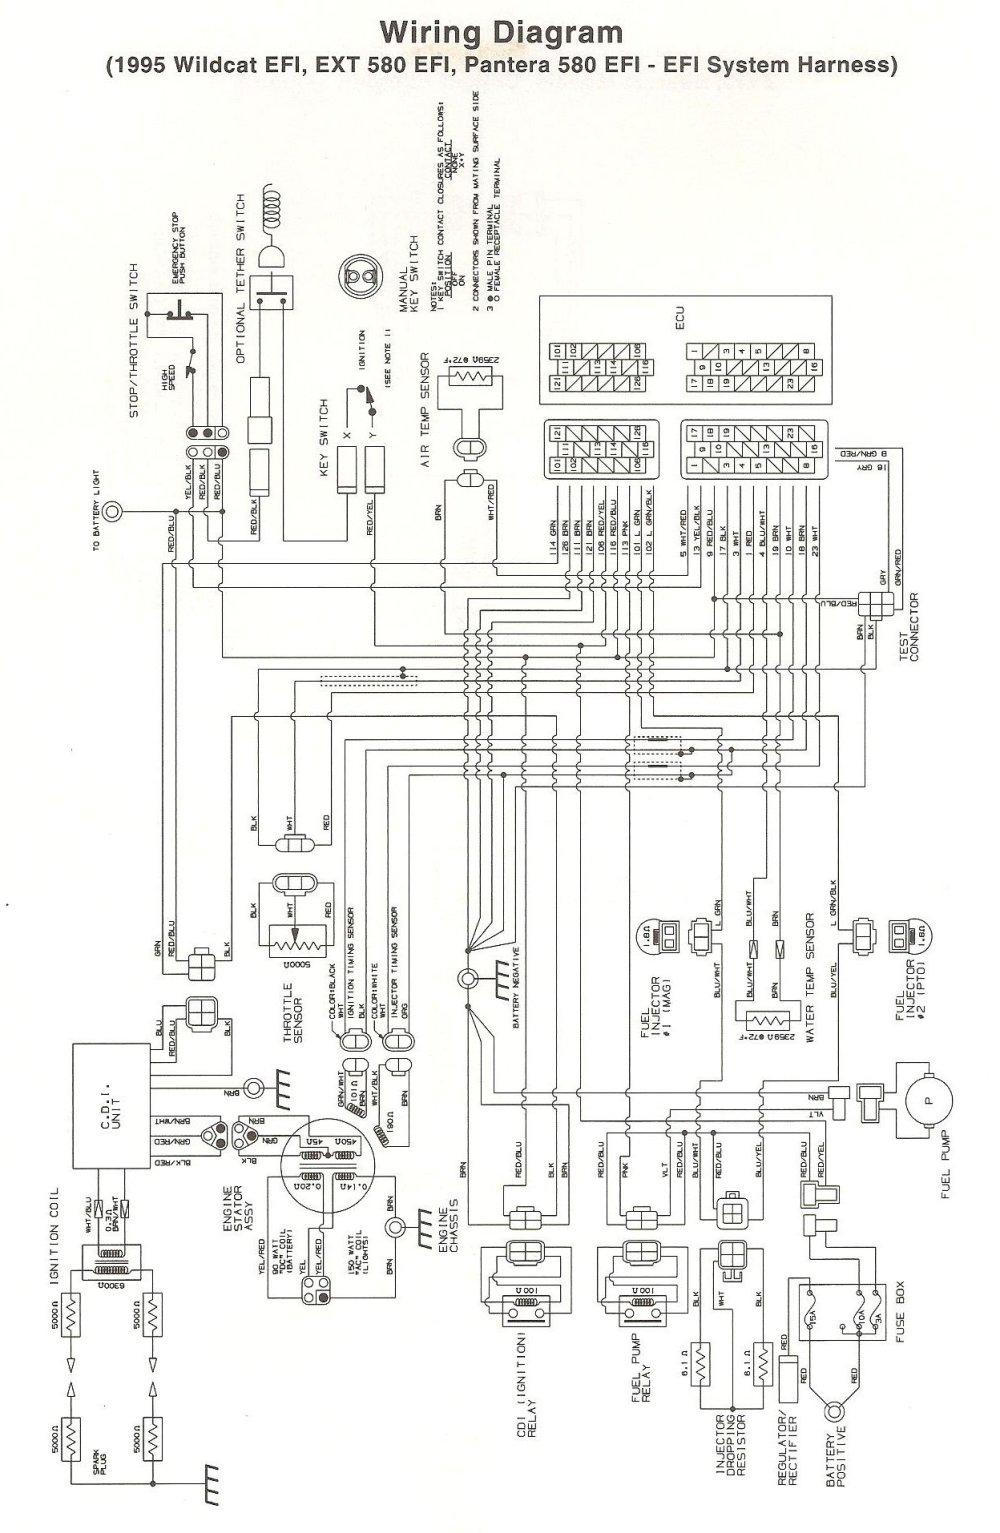 medium resolution of arctic cat thundercat snowmobile wiring diagram wiring diagram rh 1 4 14 jacobwinterstein com 2001 arctic